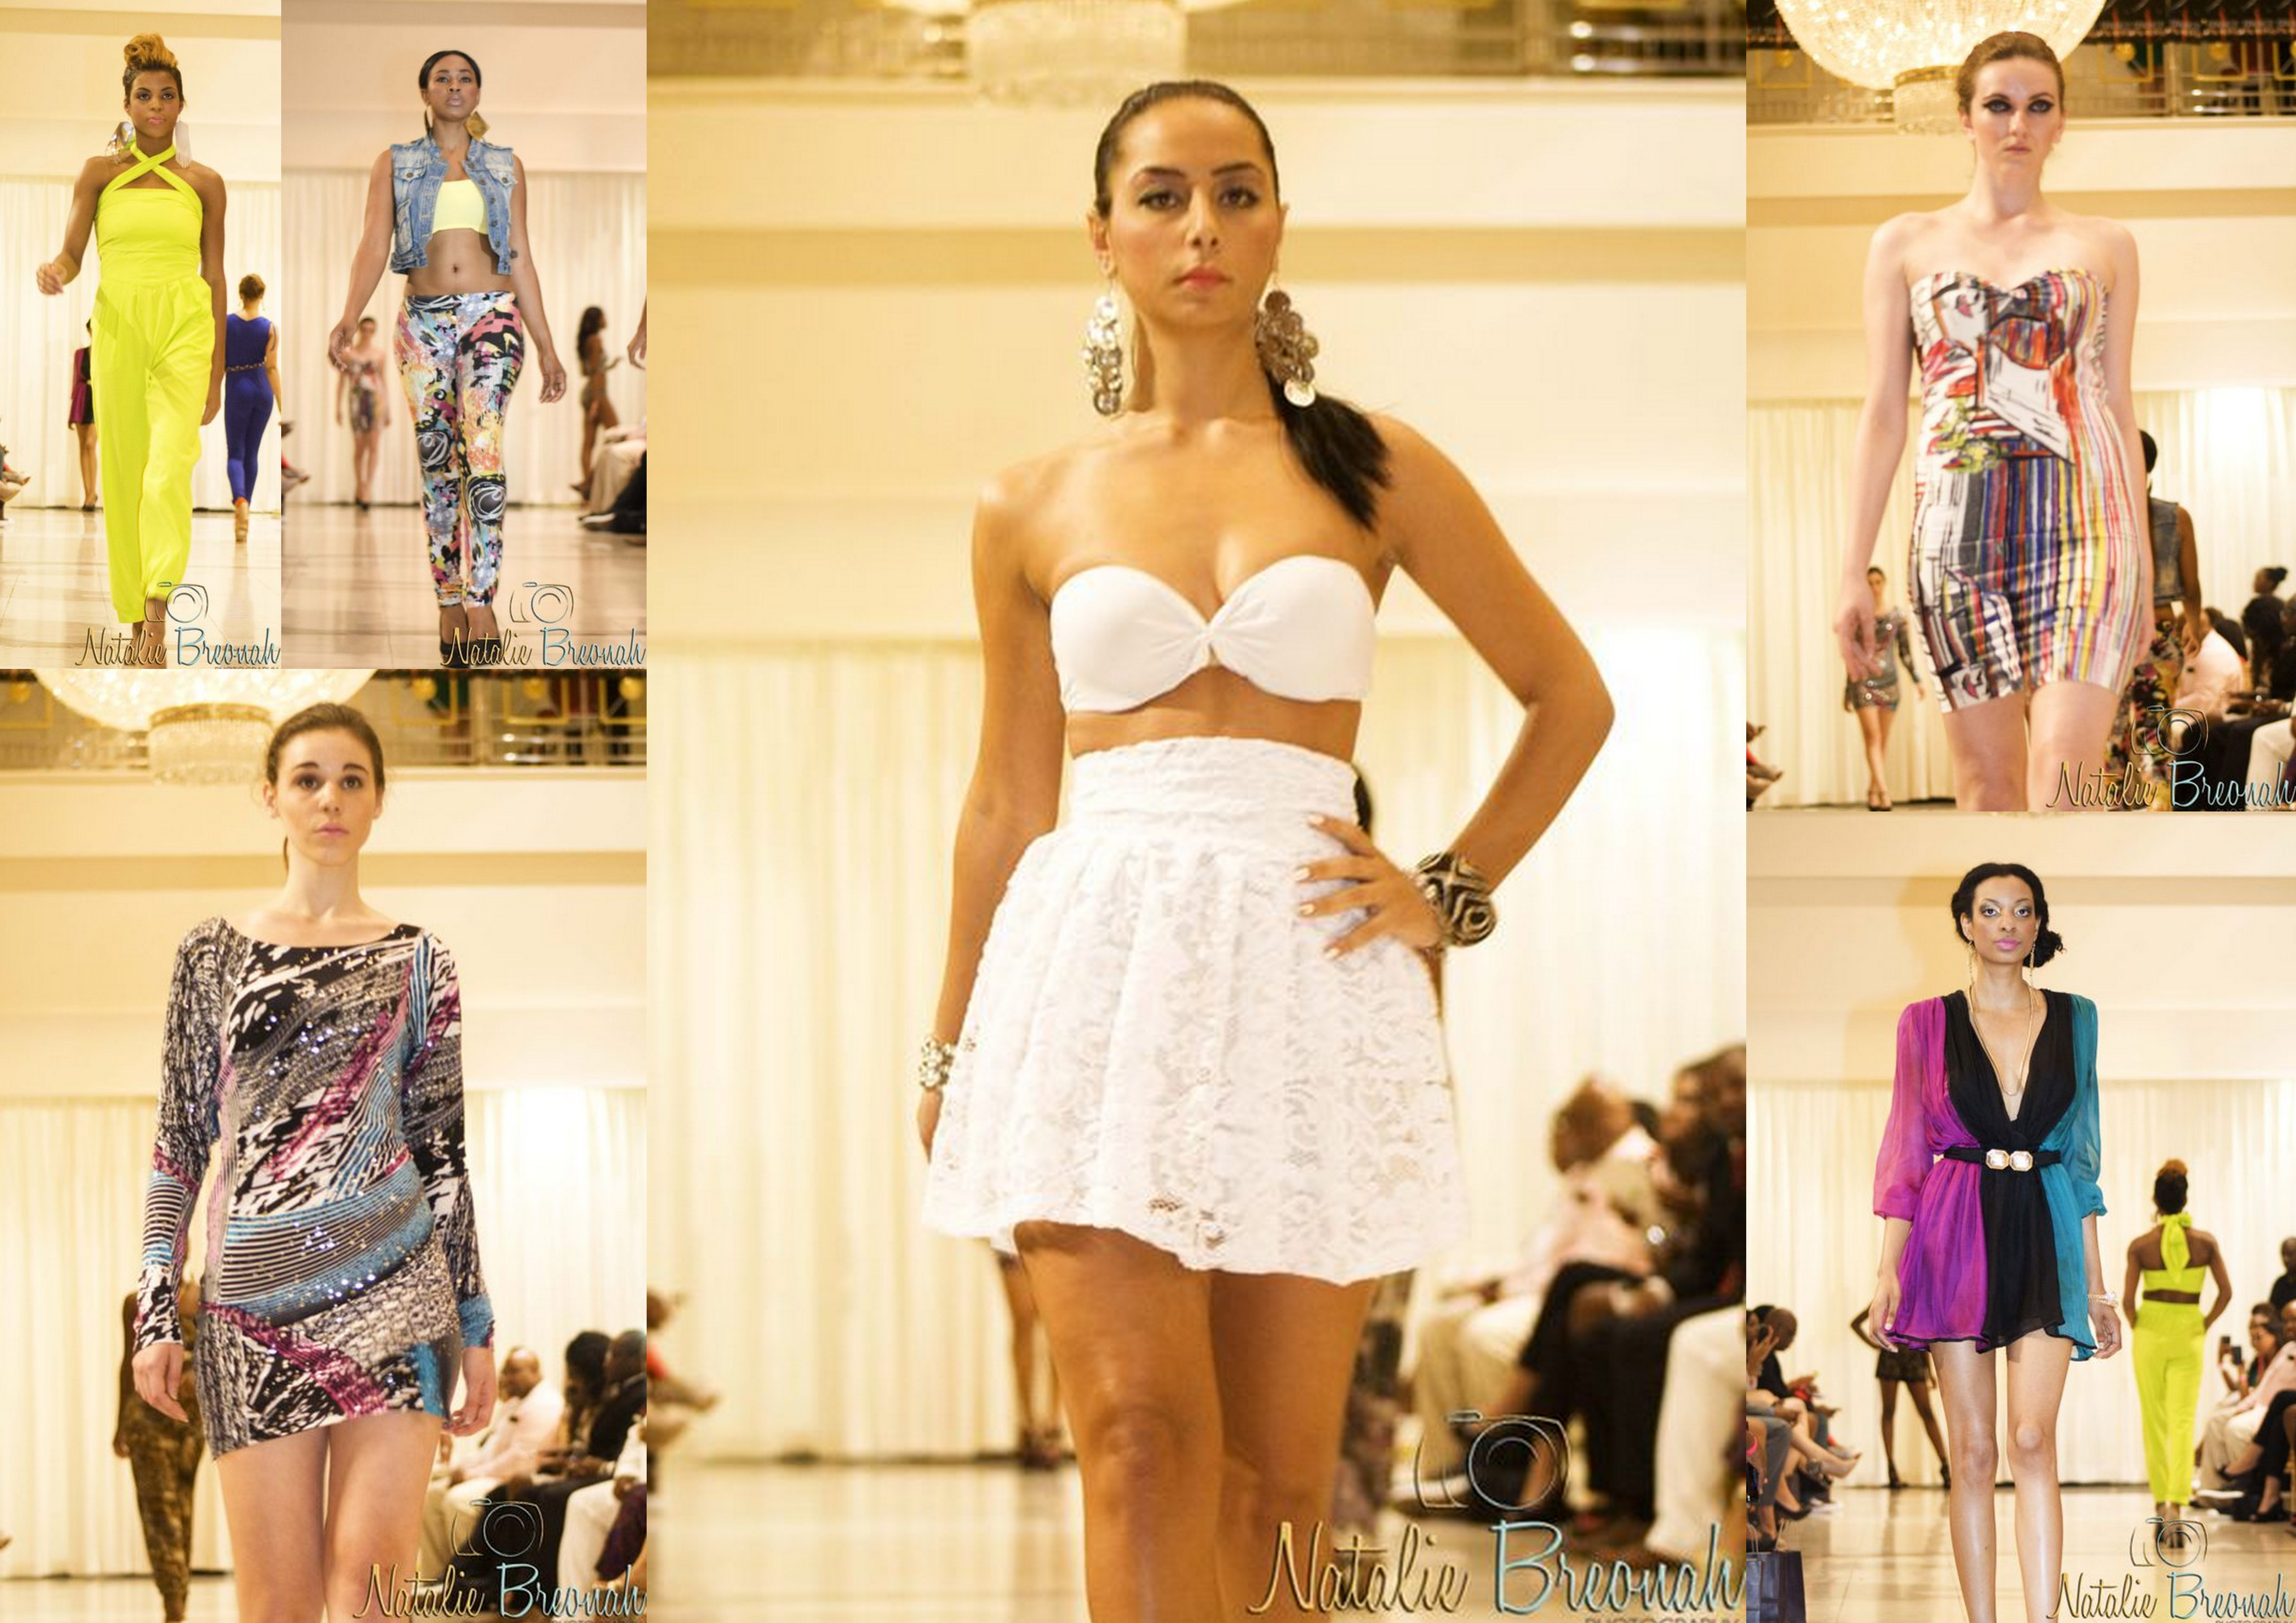 Fashion Design / Sewing Classes in Atlanta GA - Learn4Good 82